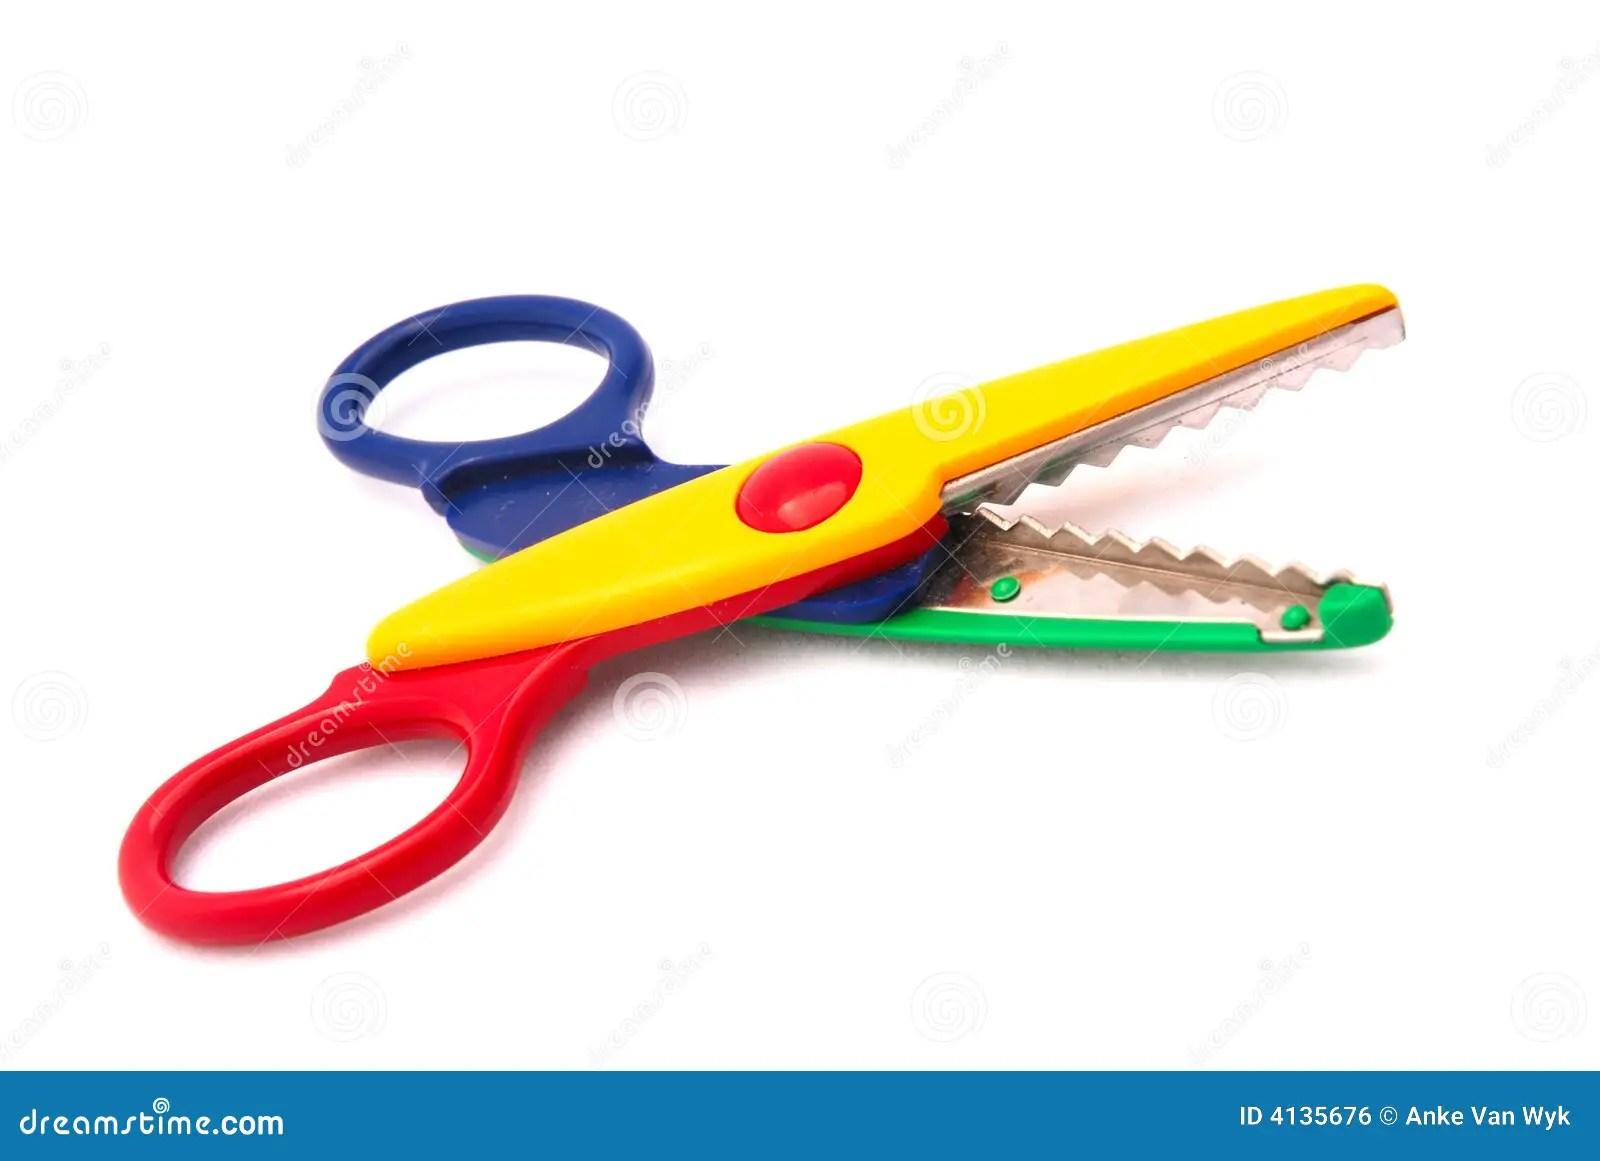 Kids Scissors Stock Photo Image Of Colourful Sharp